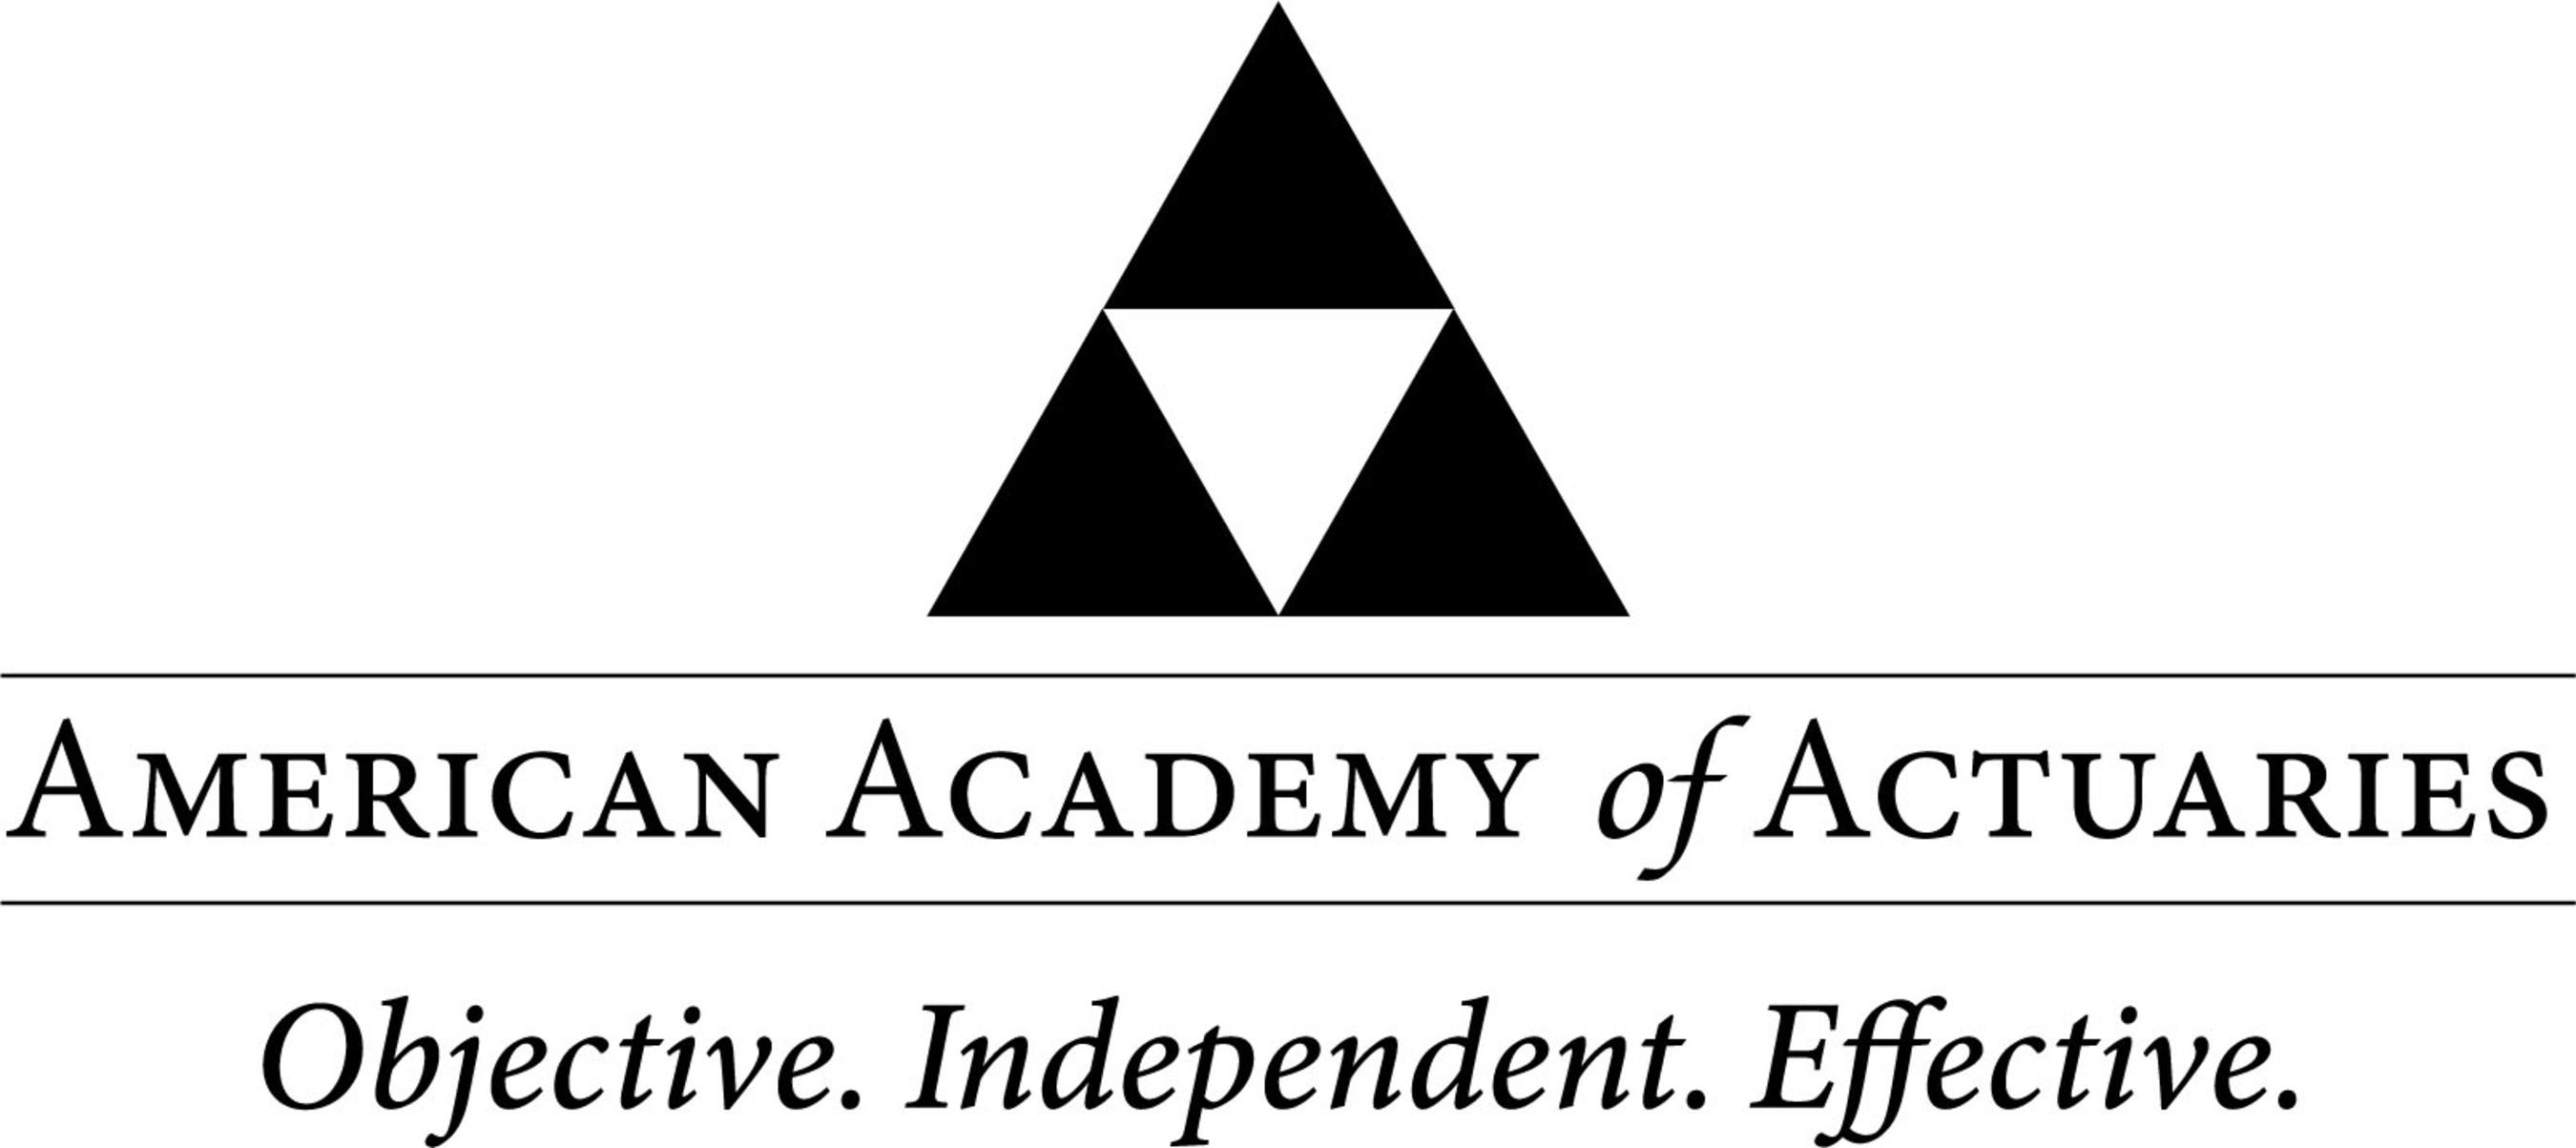 American Academy of Actuaries.